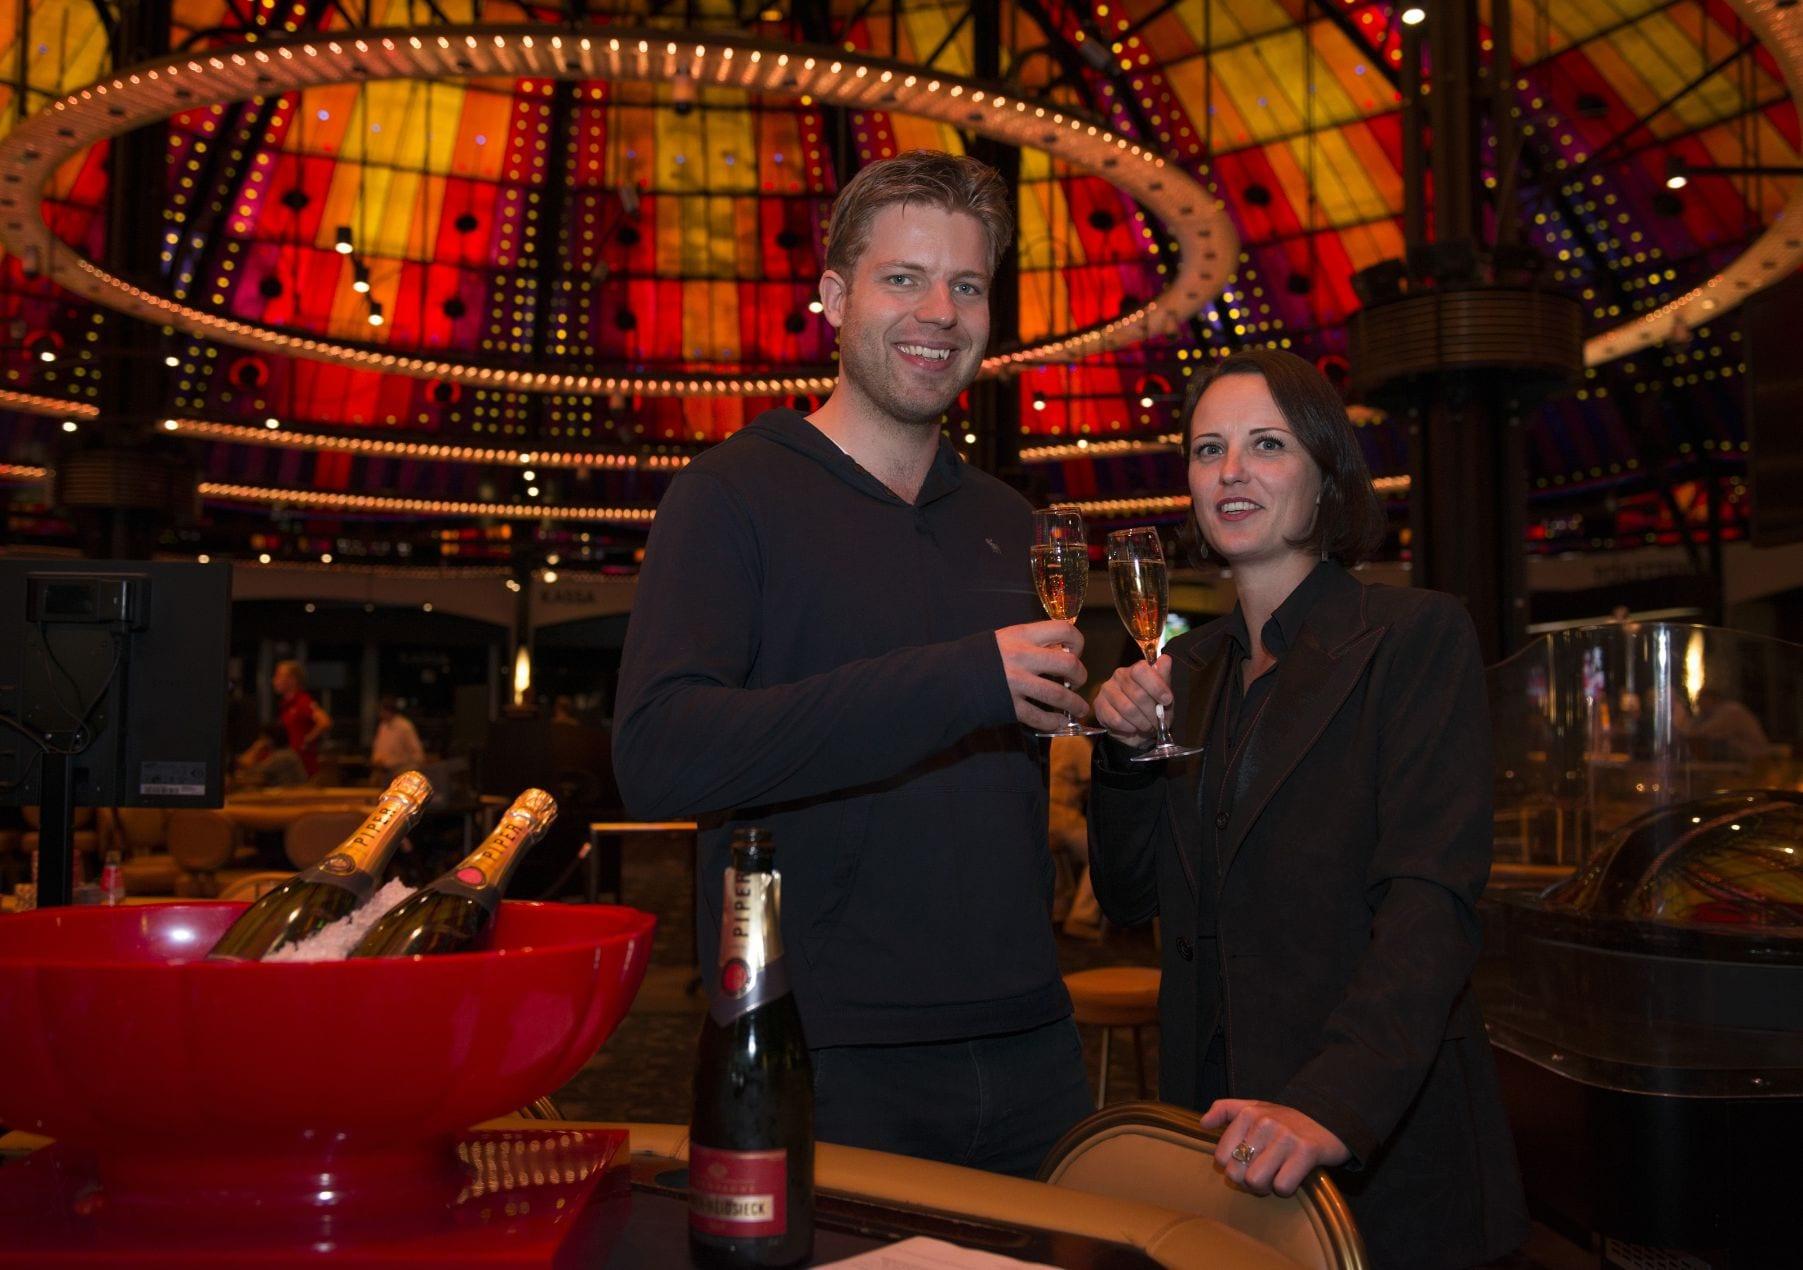 Holland casino pokertoernooi agenda